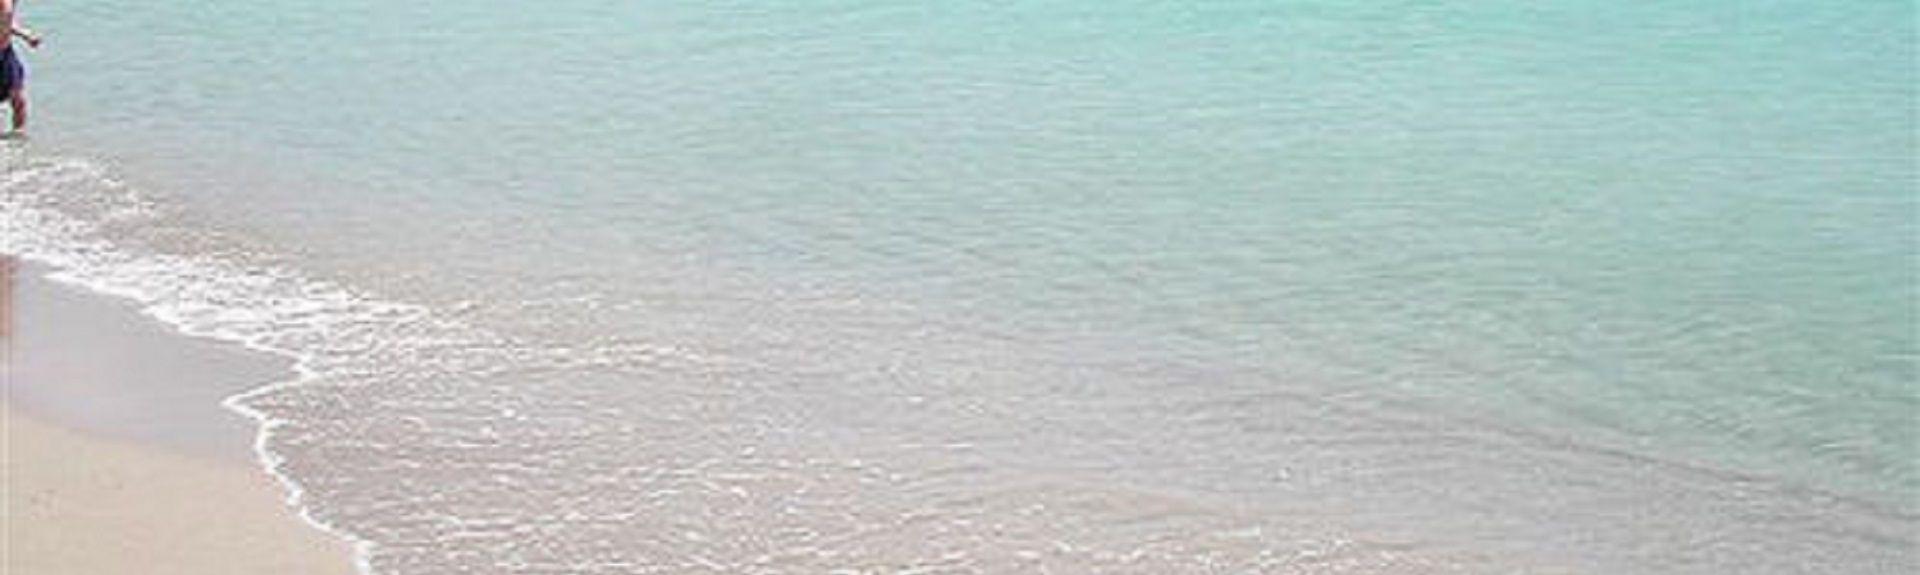 Cavalli Beach, Marina di Mancaversa, Apulien, Italien